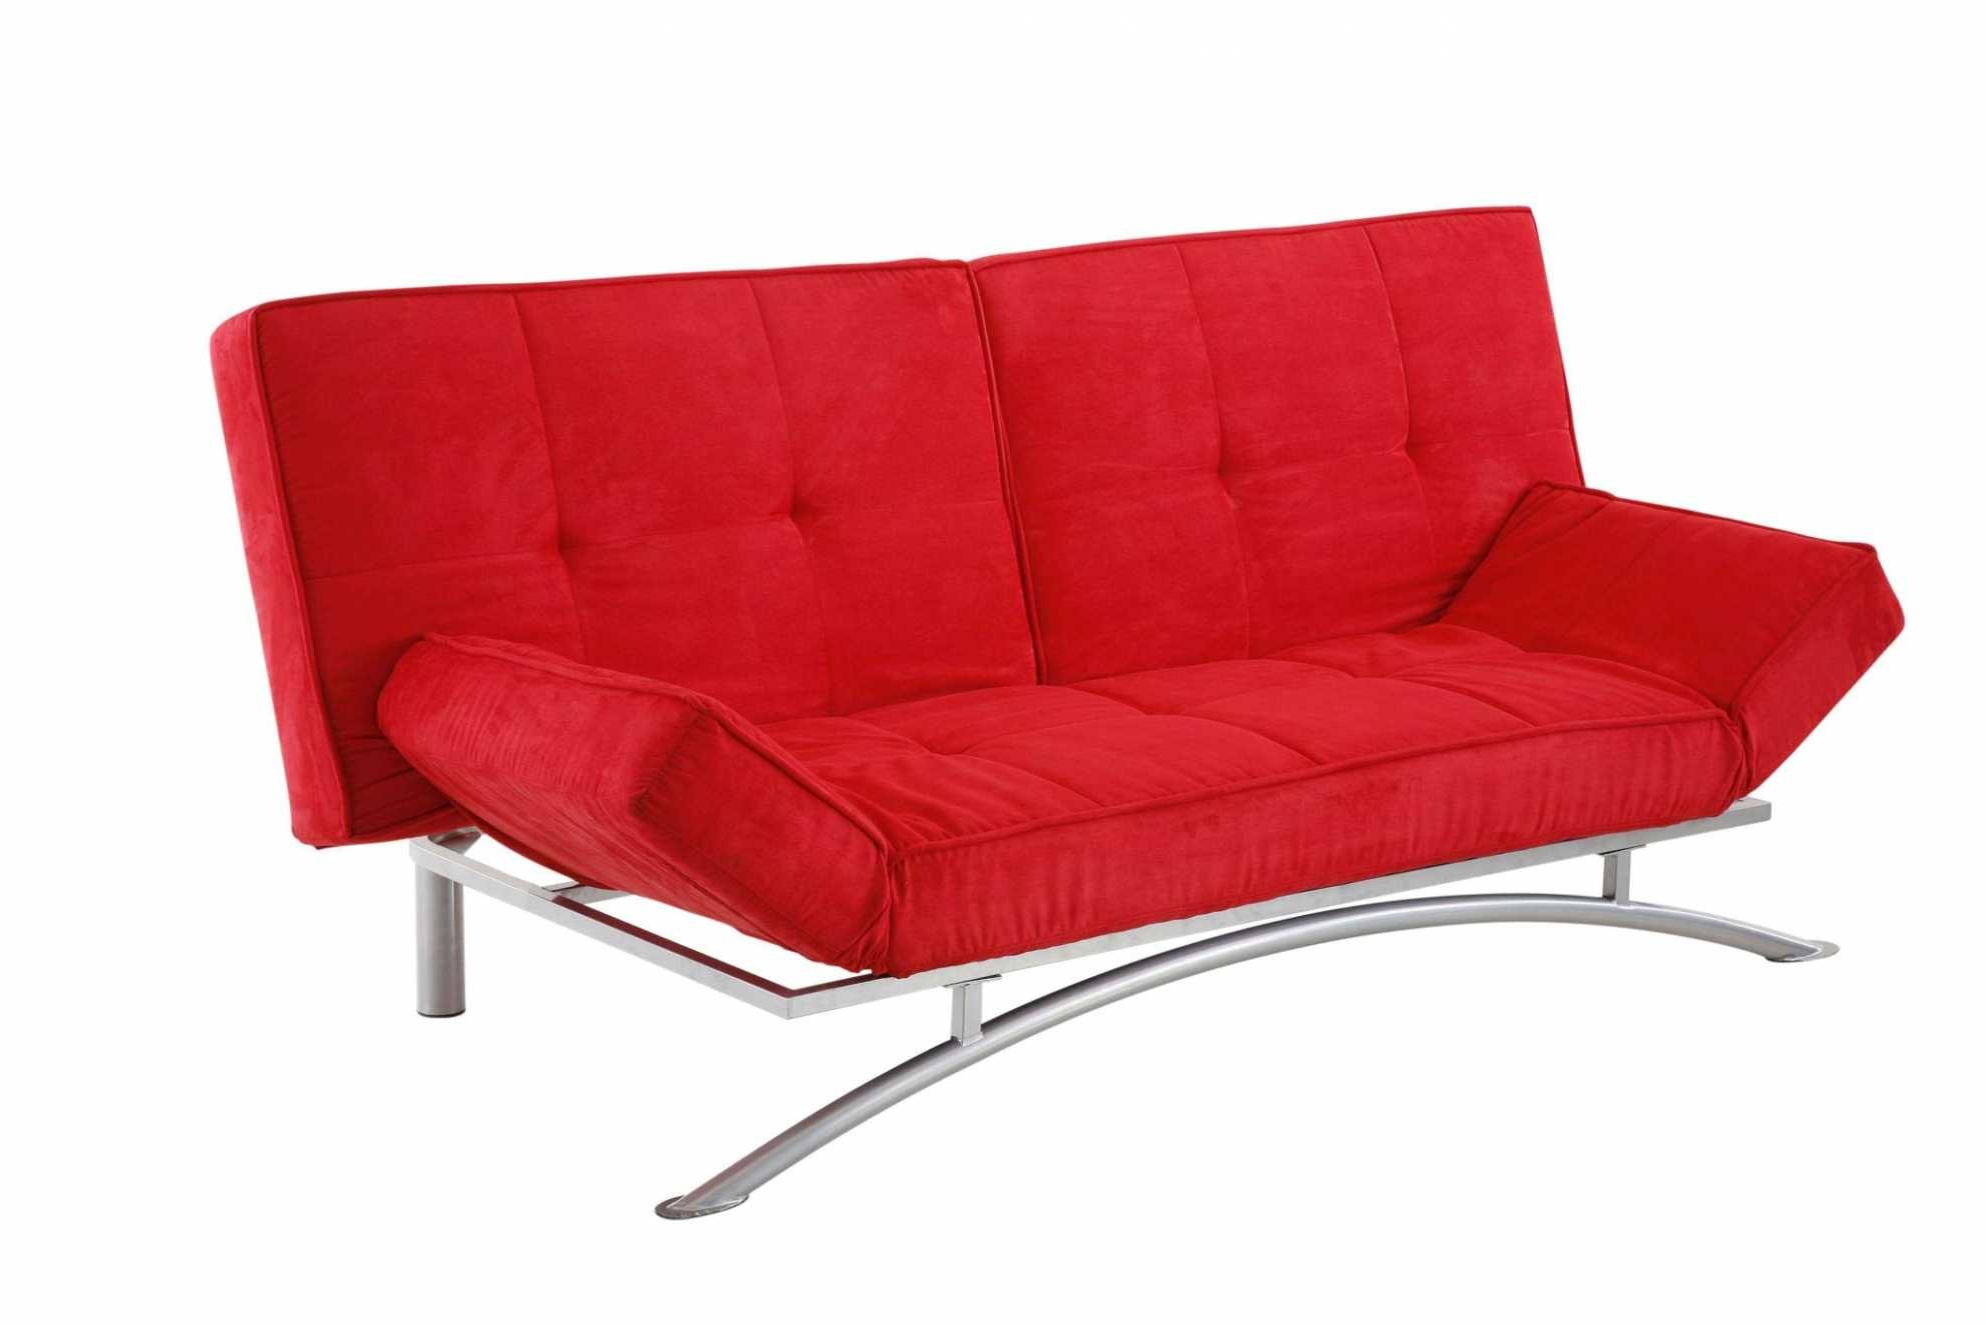 Oferta sofa cama gallery of oferta exprs sof cama for Ikea sofa chaise longue cama